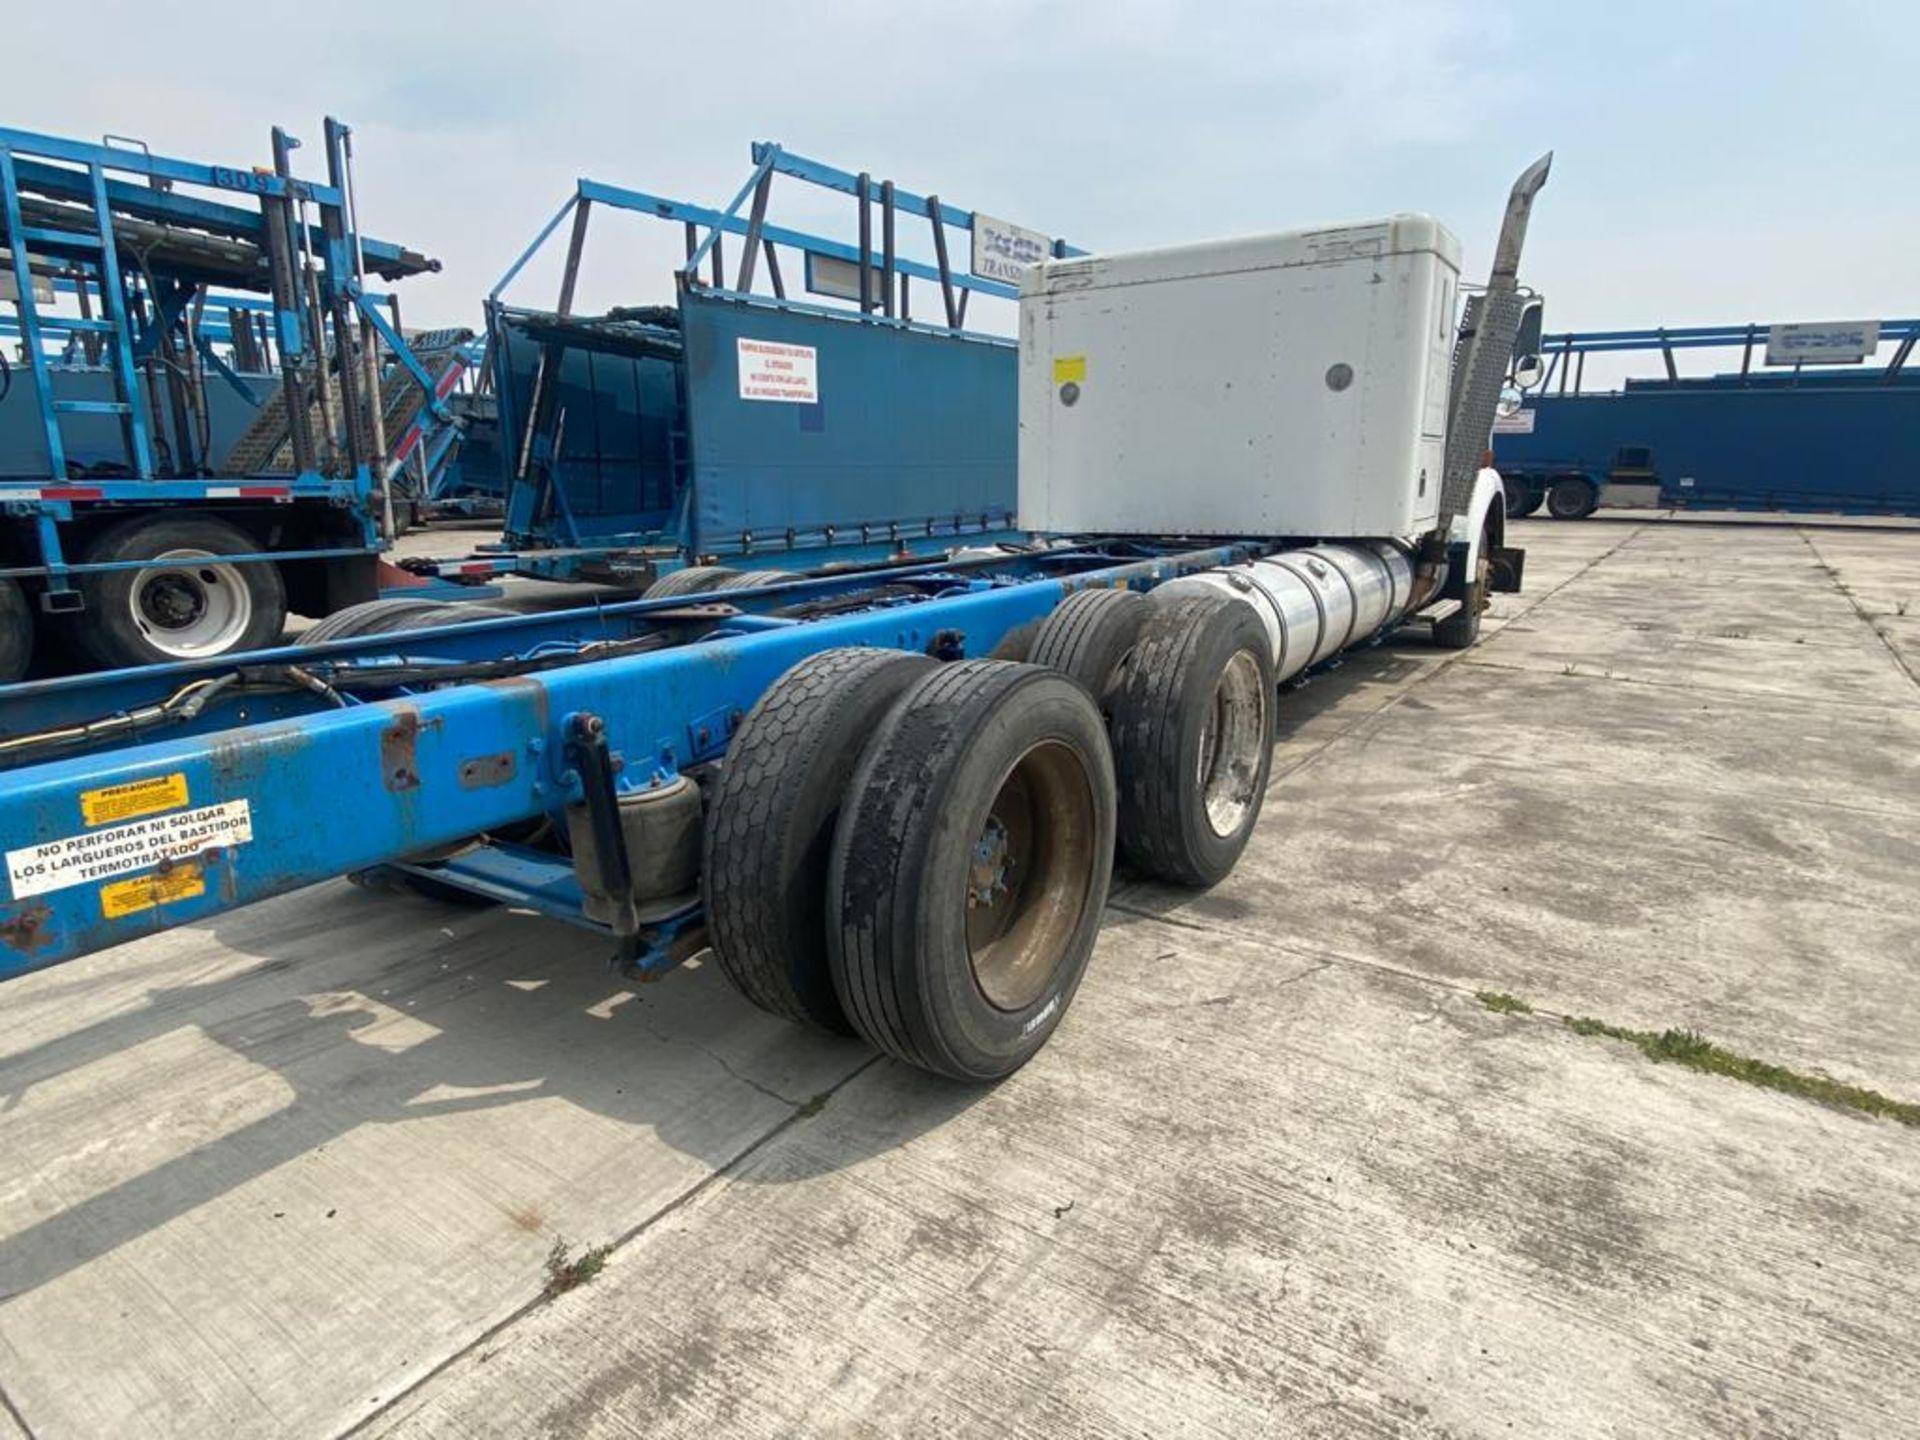 1999 Kenworth Sleeper truck tractor, standard transmission of 18 speeds - Image 16 of 62